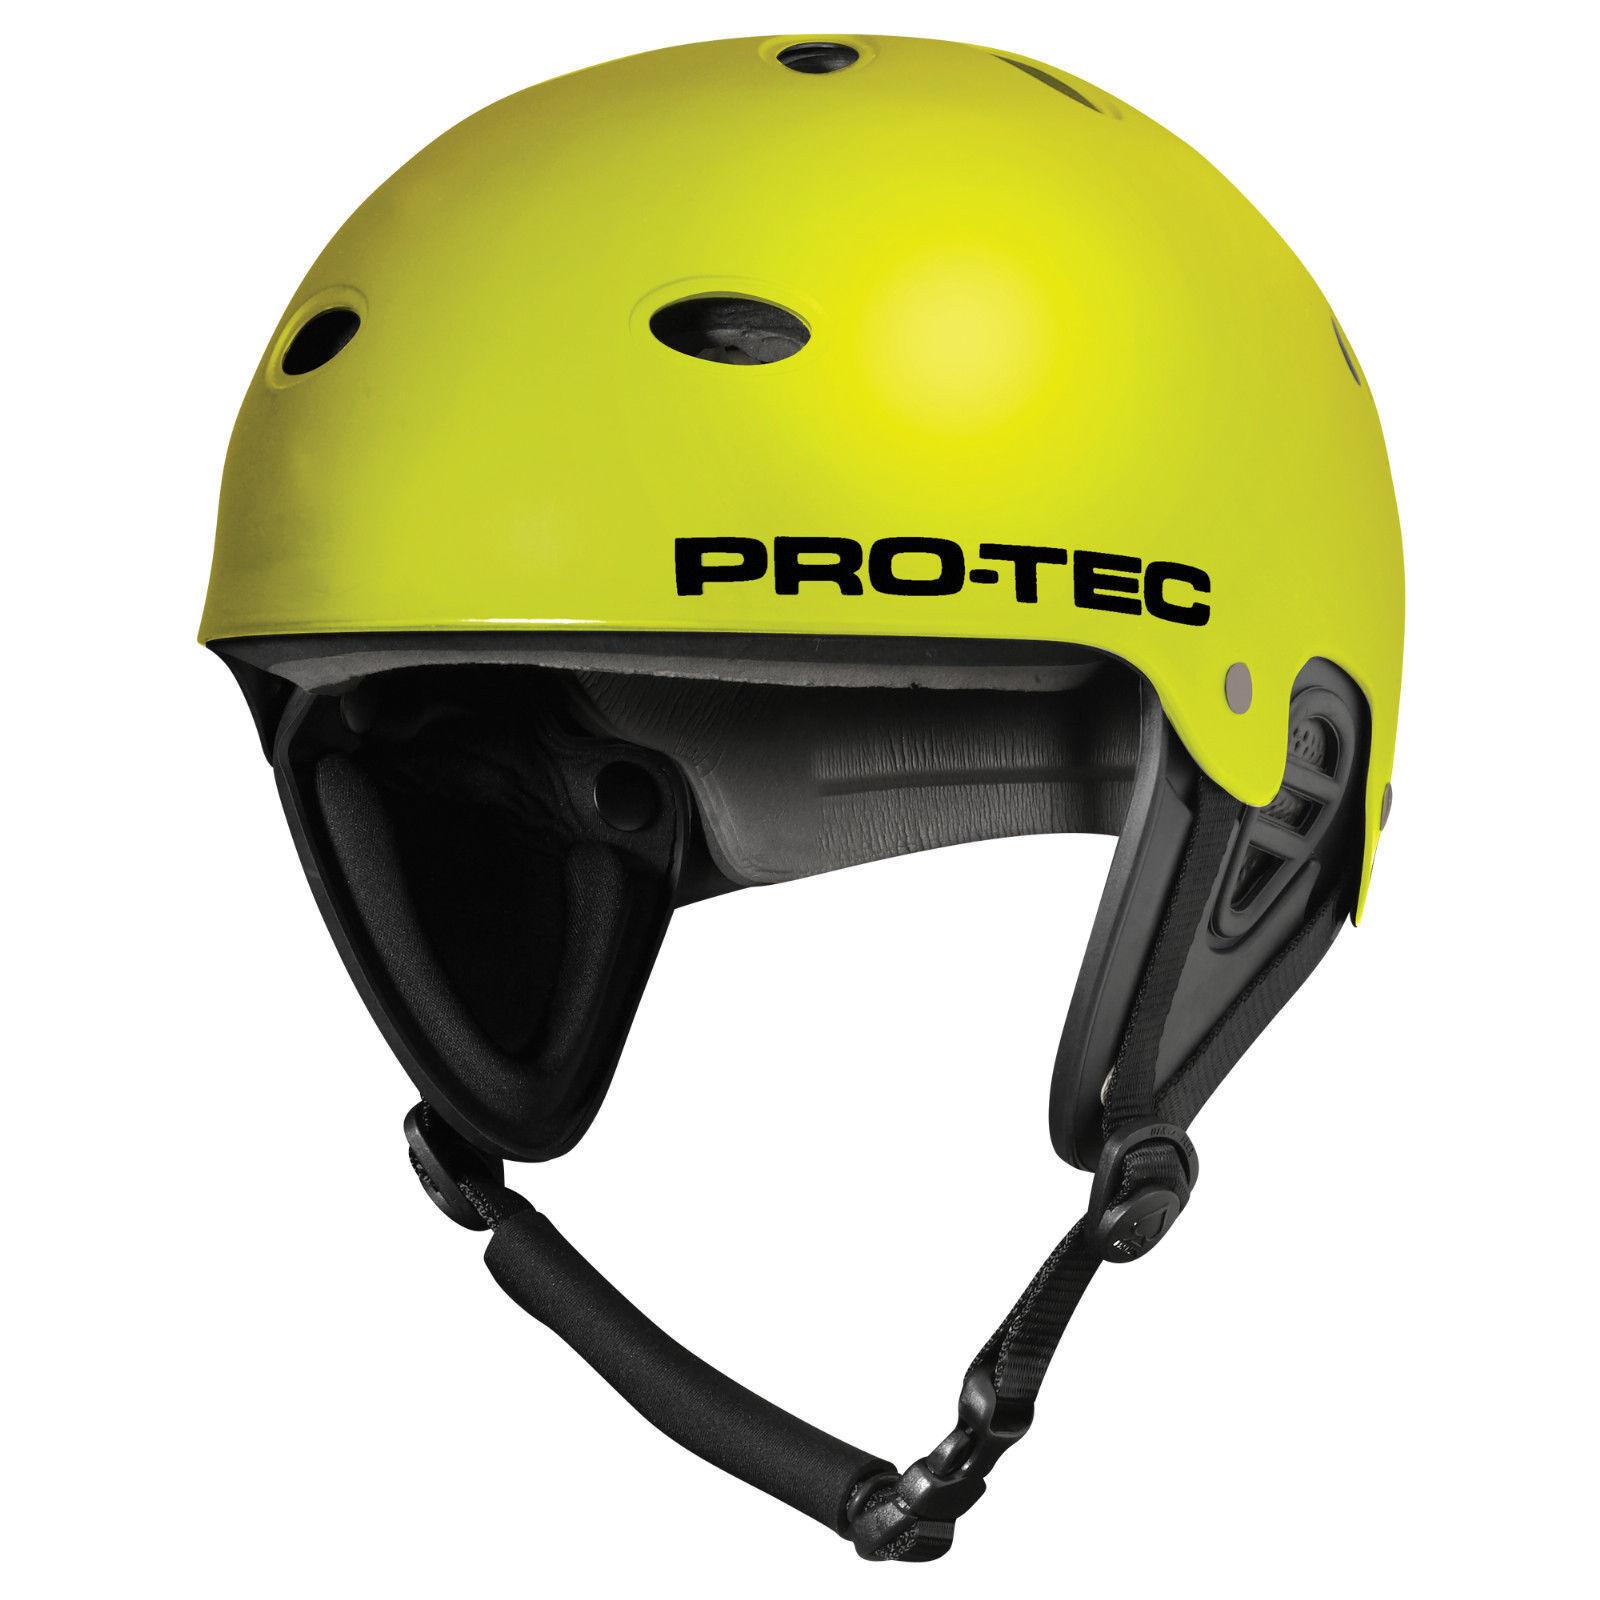 Pro-tec B2 Wake Watersports Wakeboard Helmet, XS, Citrus yellow. 13407